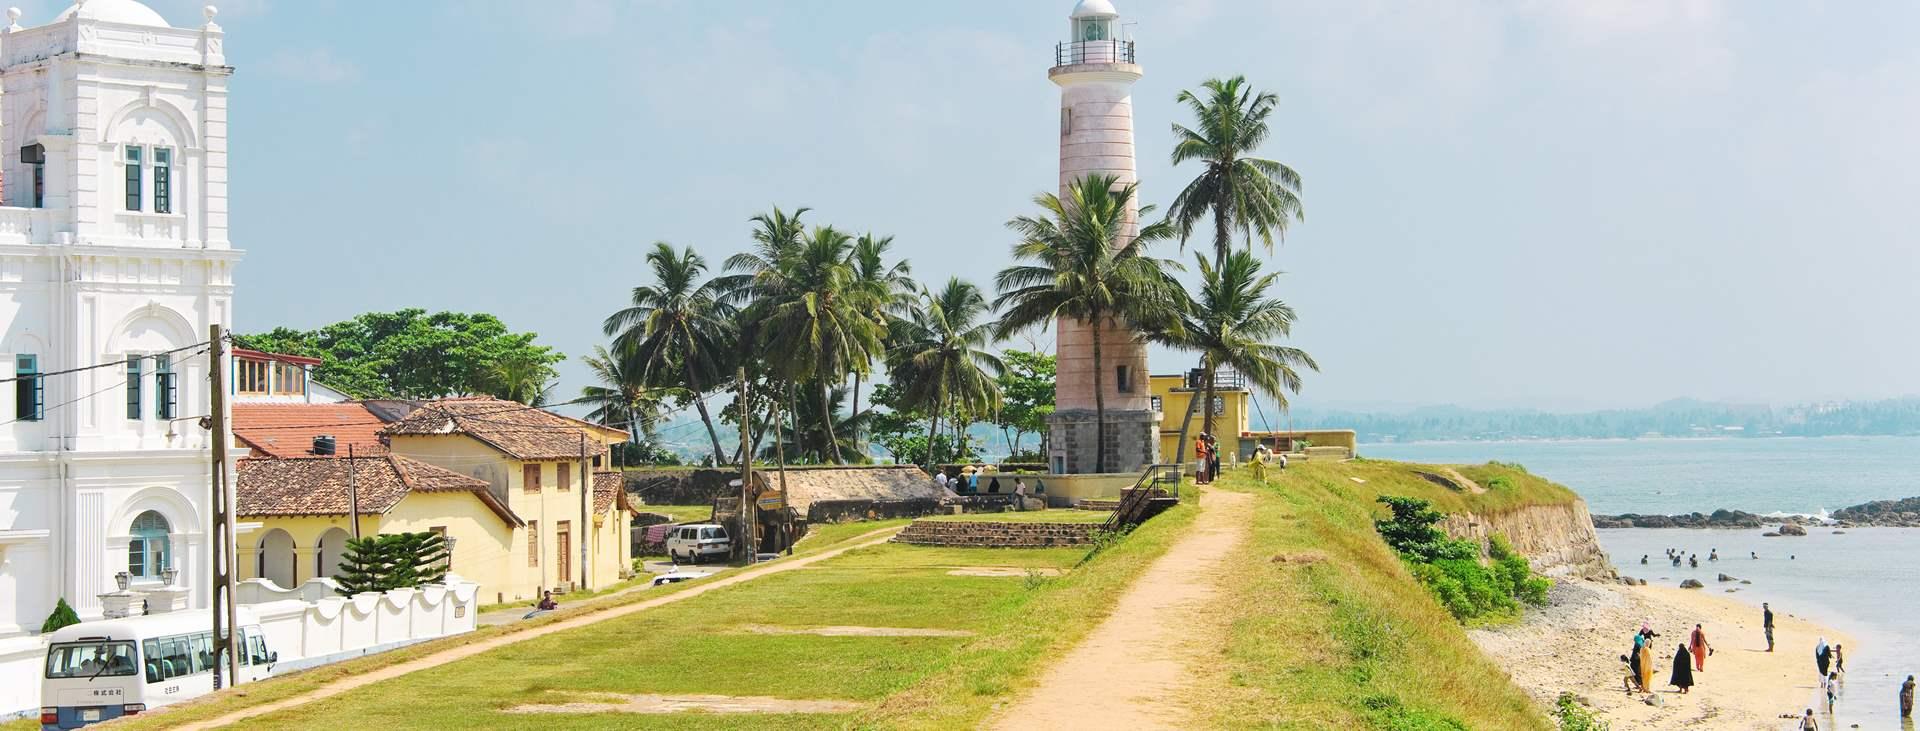 Boka din resa till Galle på Sri Lanka med Ving